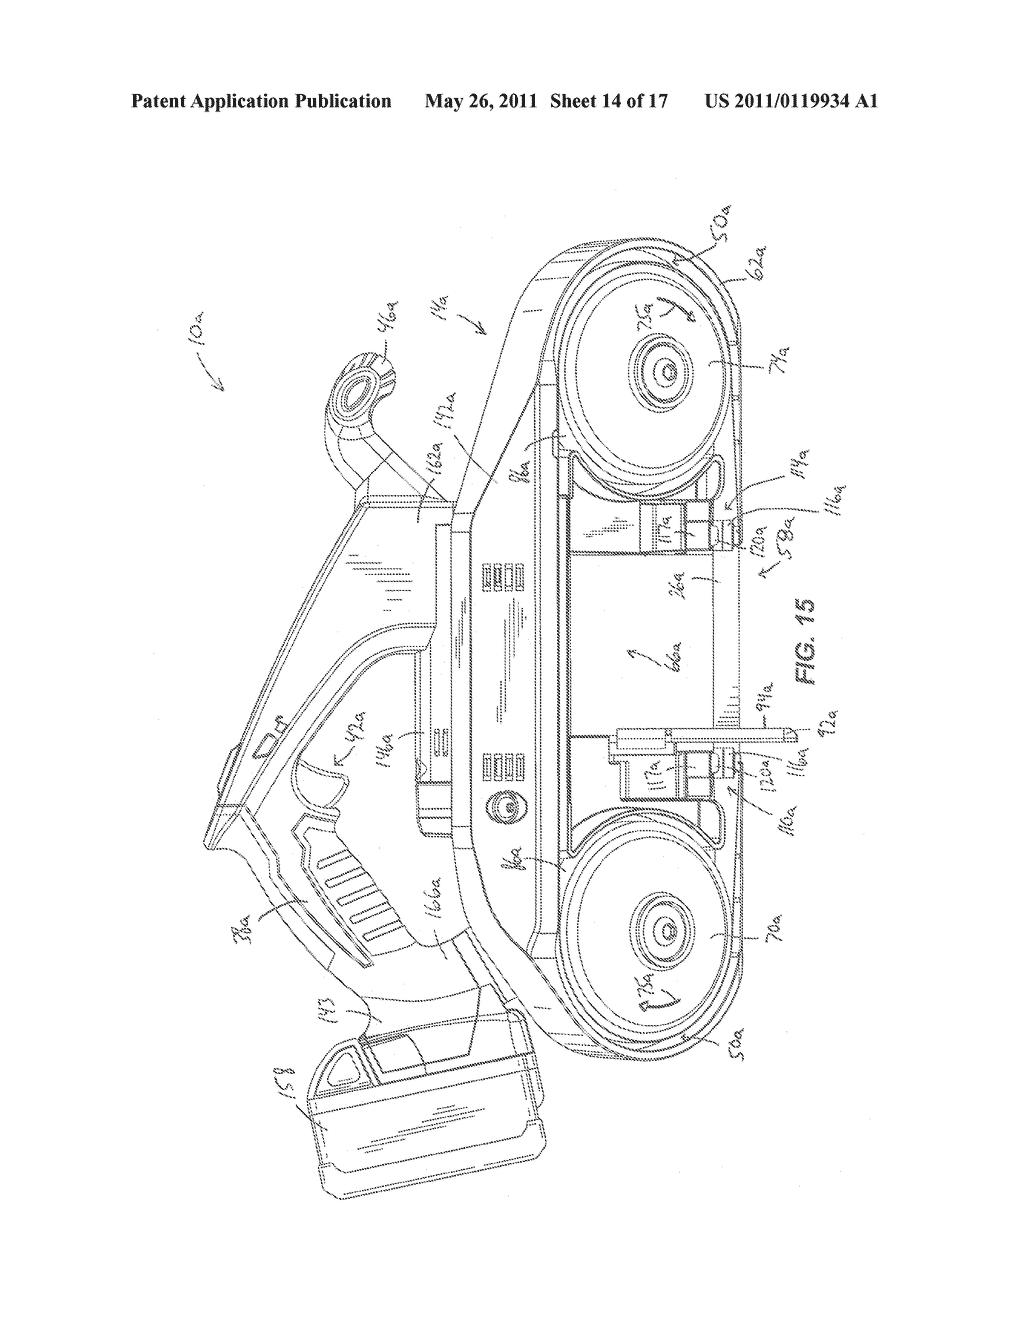 hight resolution of band saw diagram schematic and image 15 rh patentsencyclopedia com rip saw skill saw makita portable